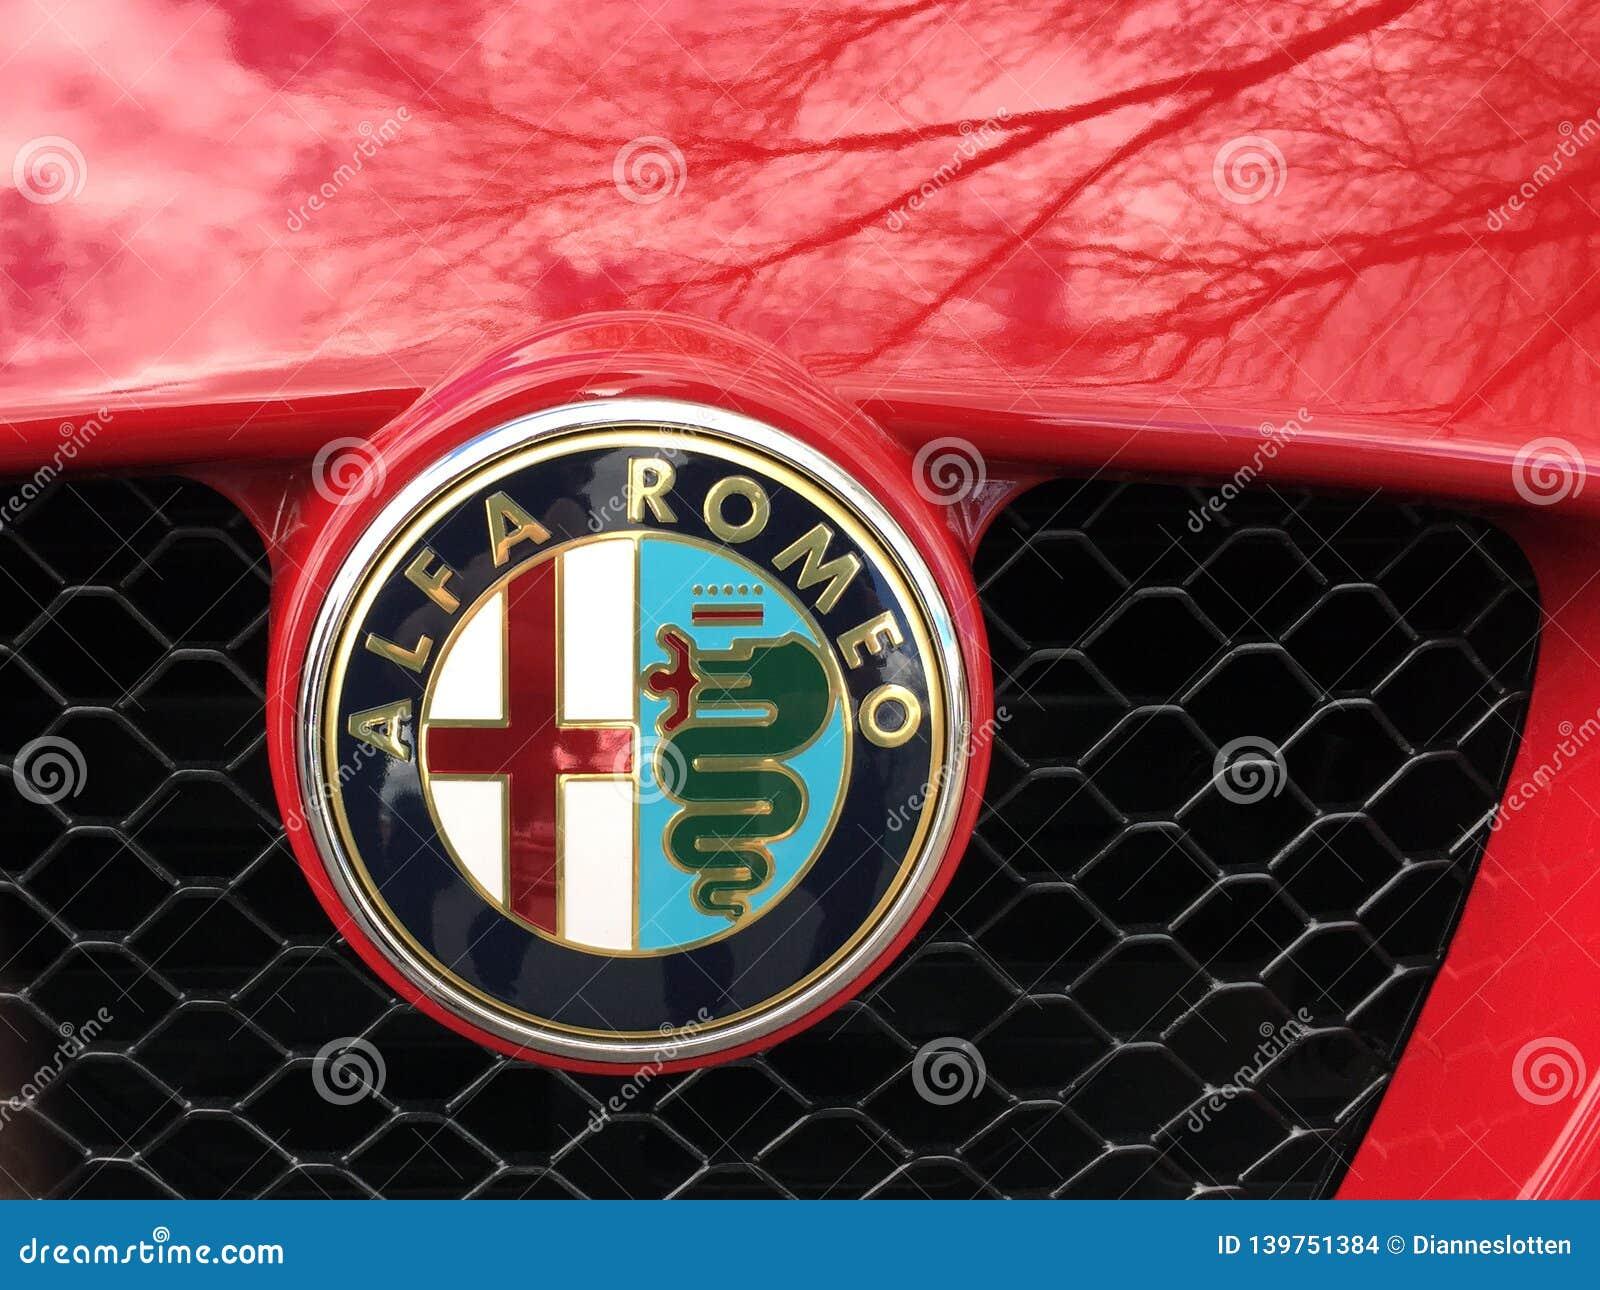 Horizontal Photo Of A Vintage Alfa Romeo Emblem Editorial Stock Image Image Of Accented Detroit 139751384